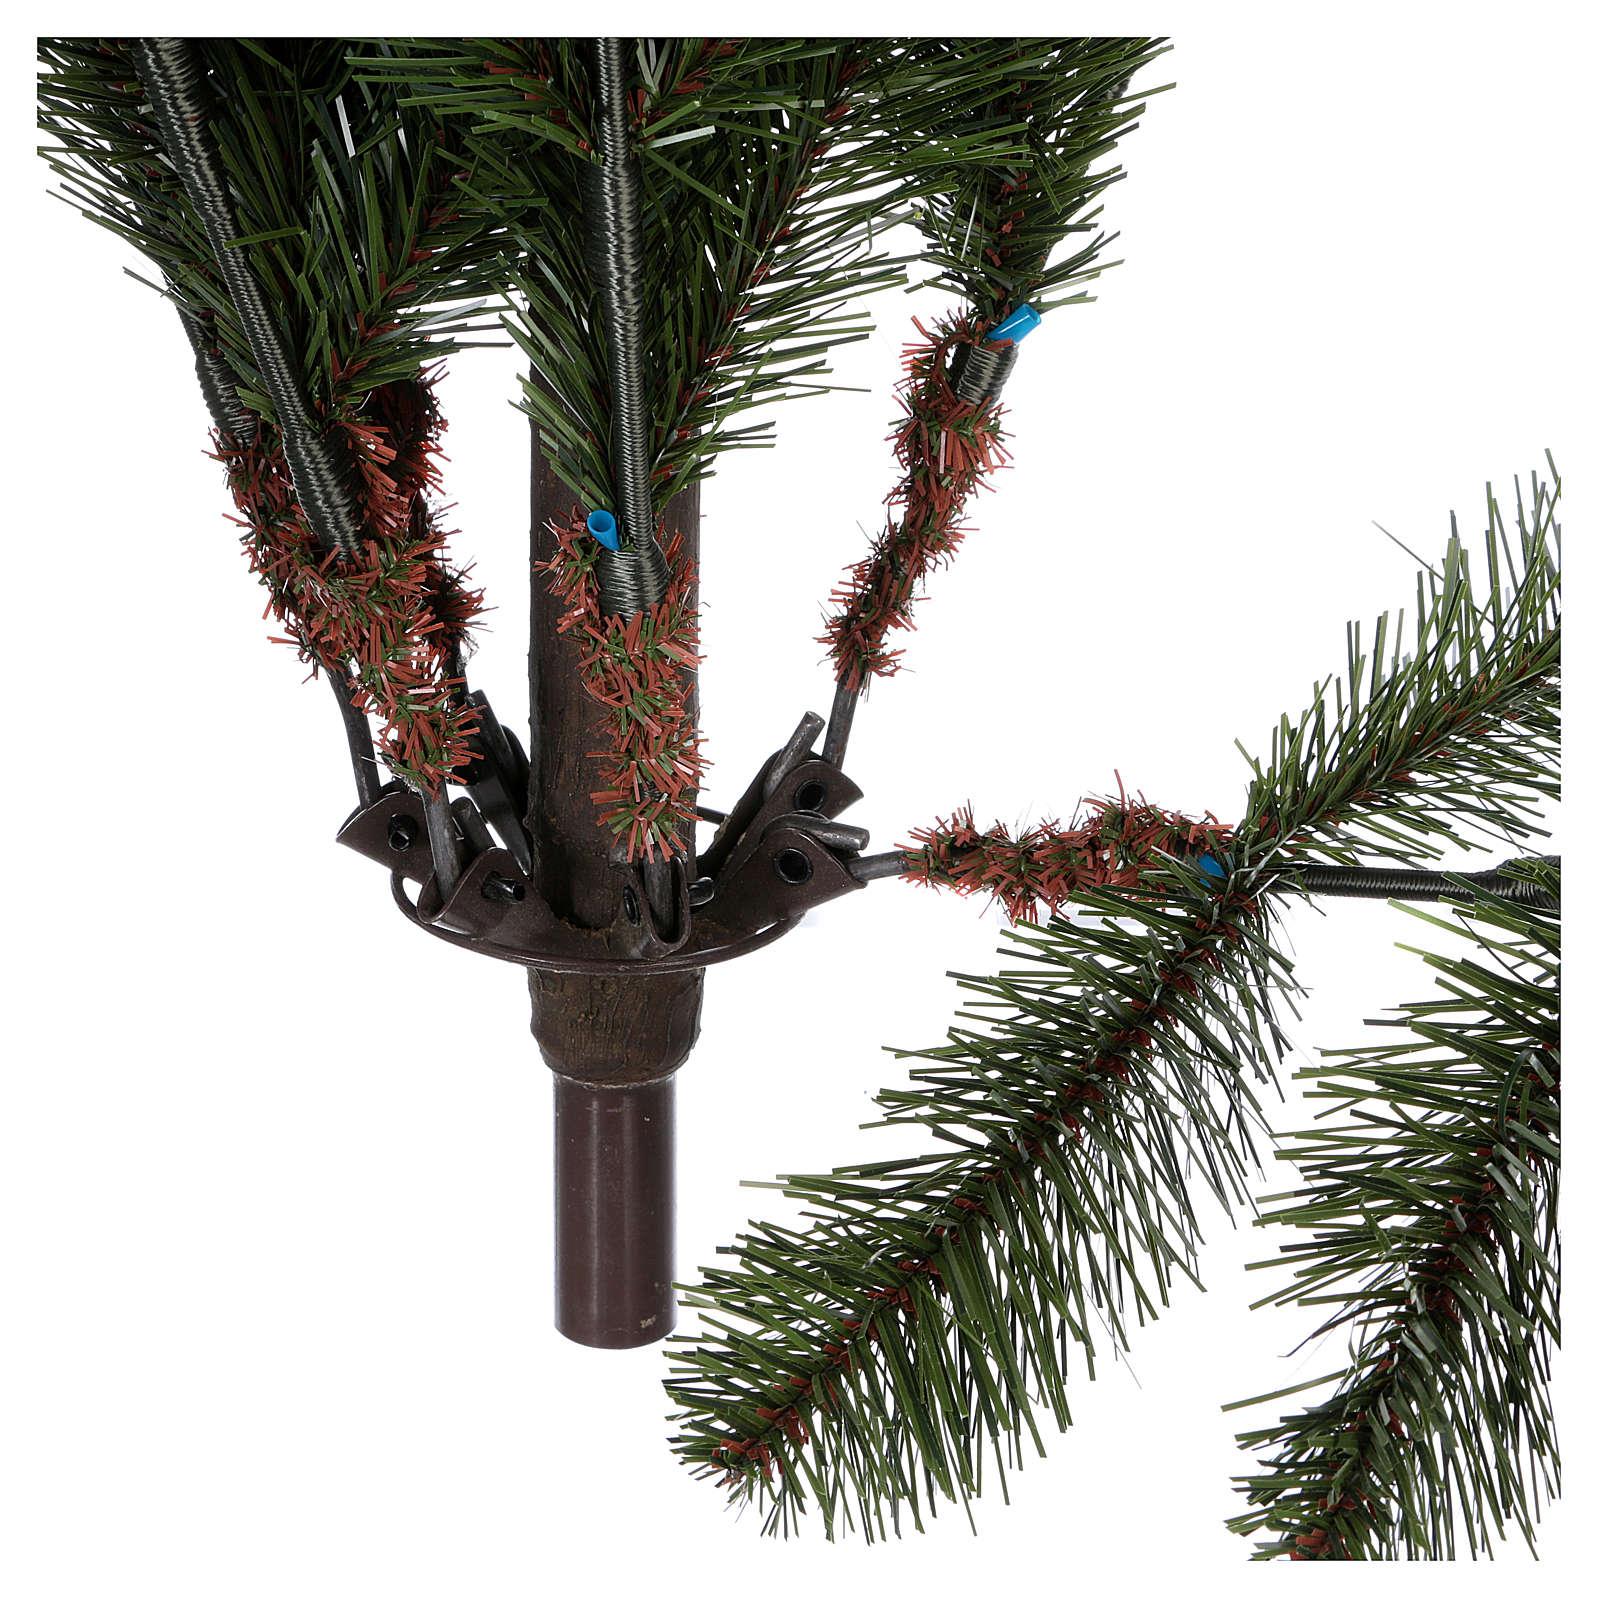 Albero di Natale 225 cm verde con pigne Woodland Carolina 3